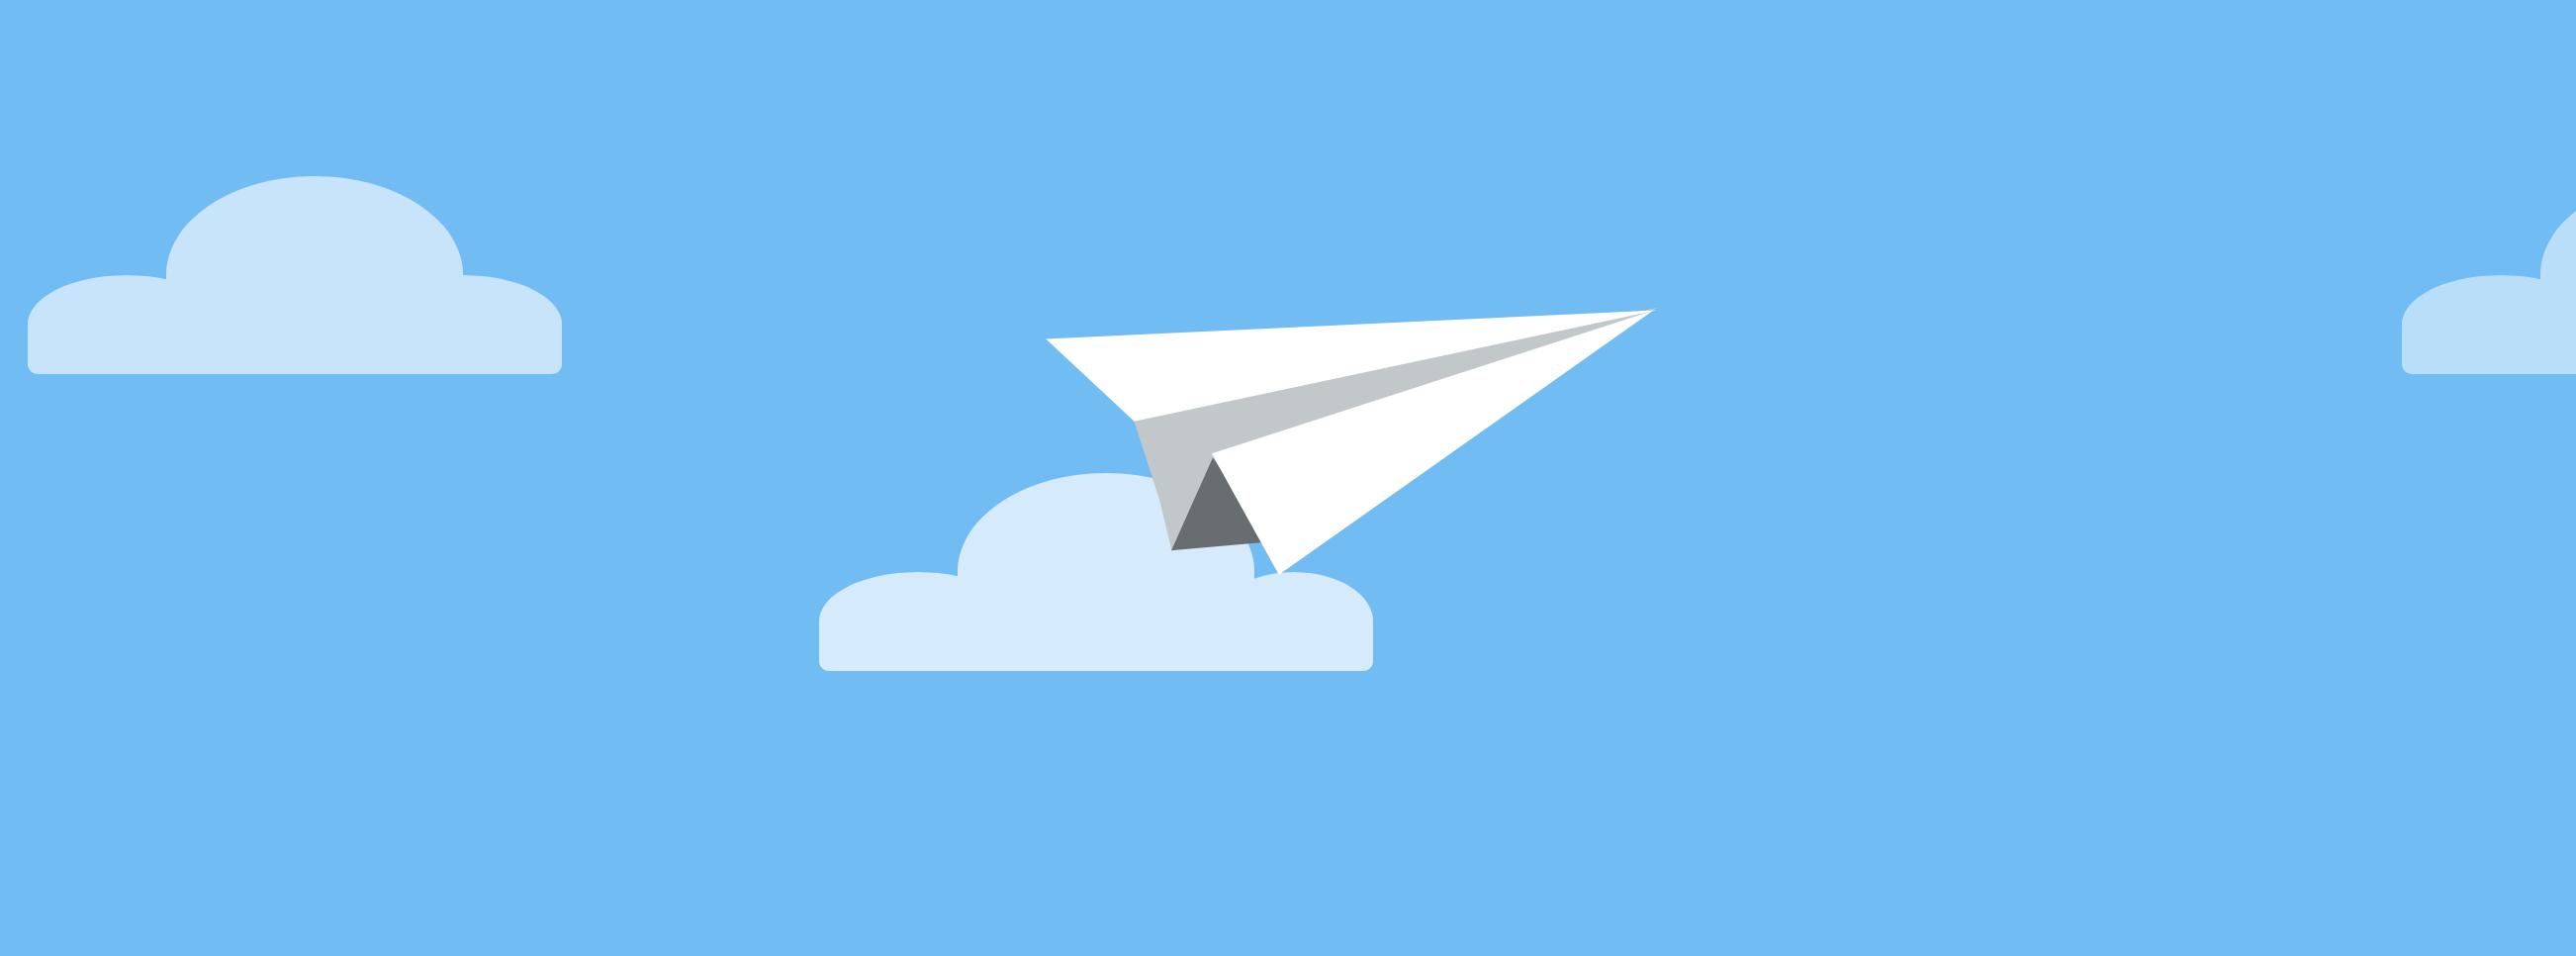 CSS Paper plane